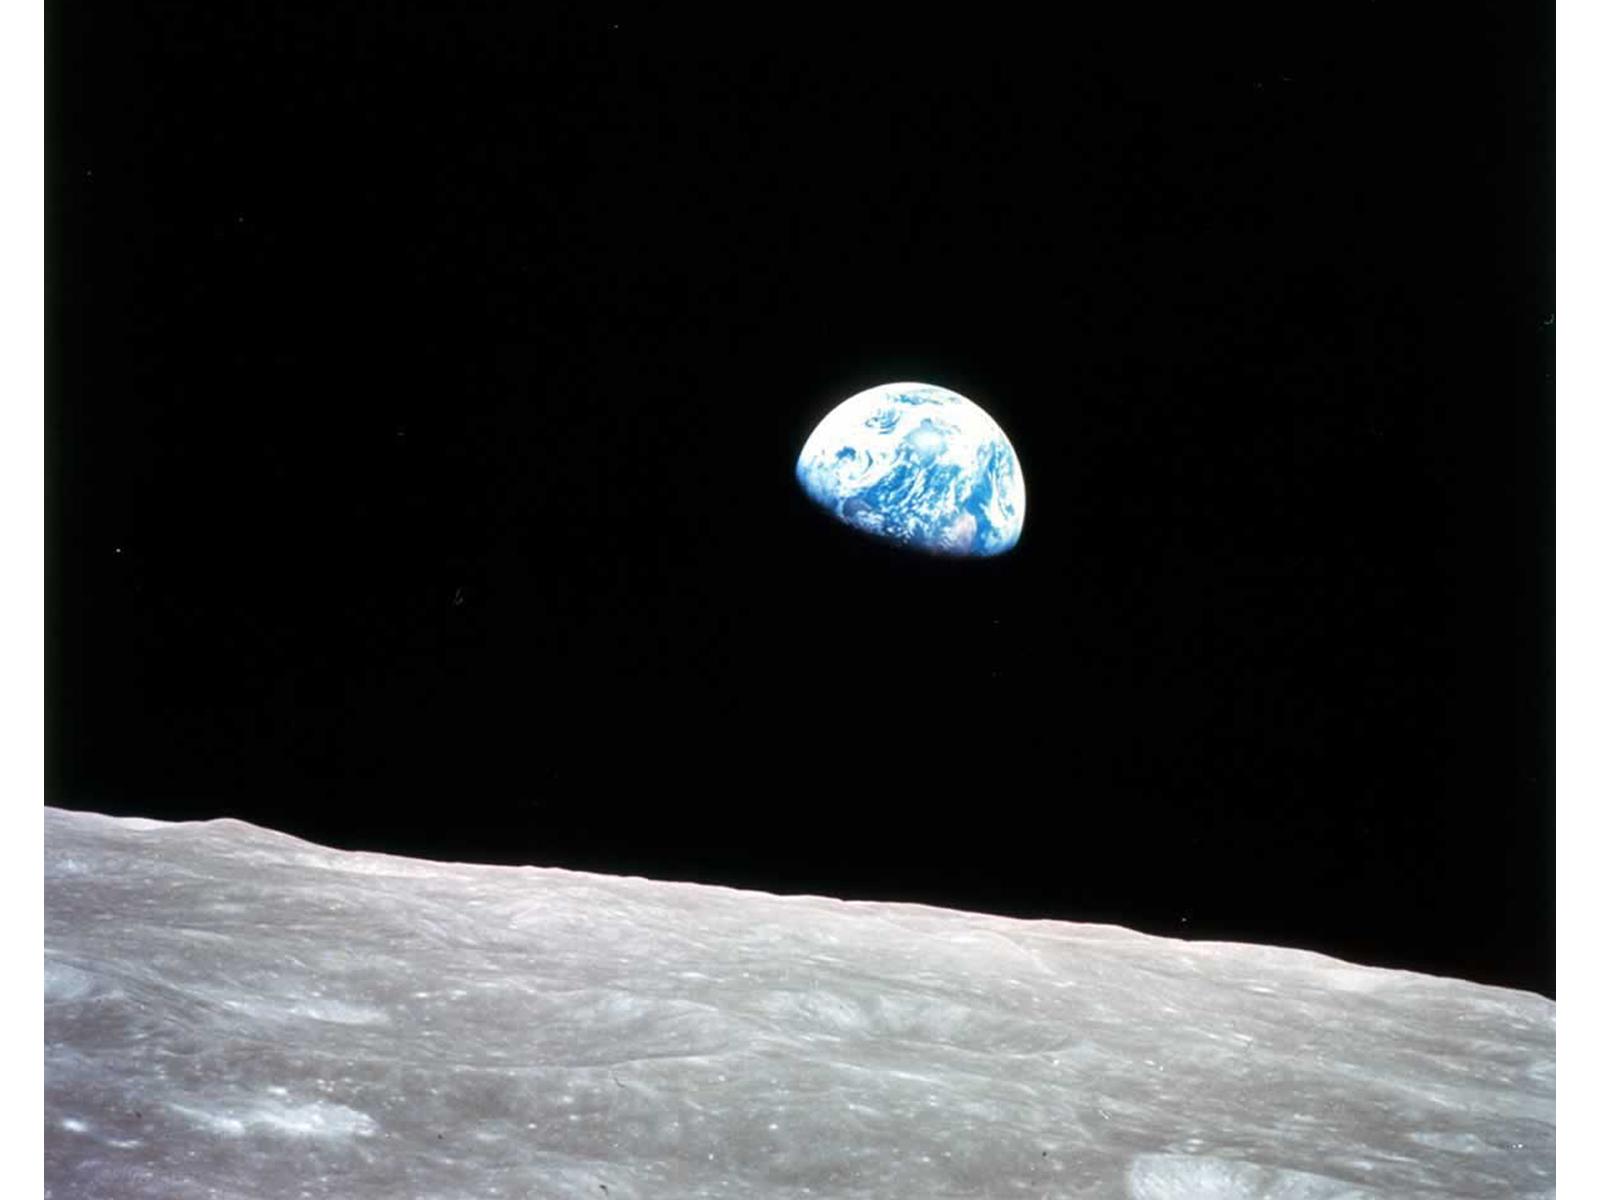 https://i1.wp.com/www.nasa.gov/images/content/261376main_31_Earthrise2.jpg